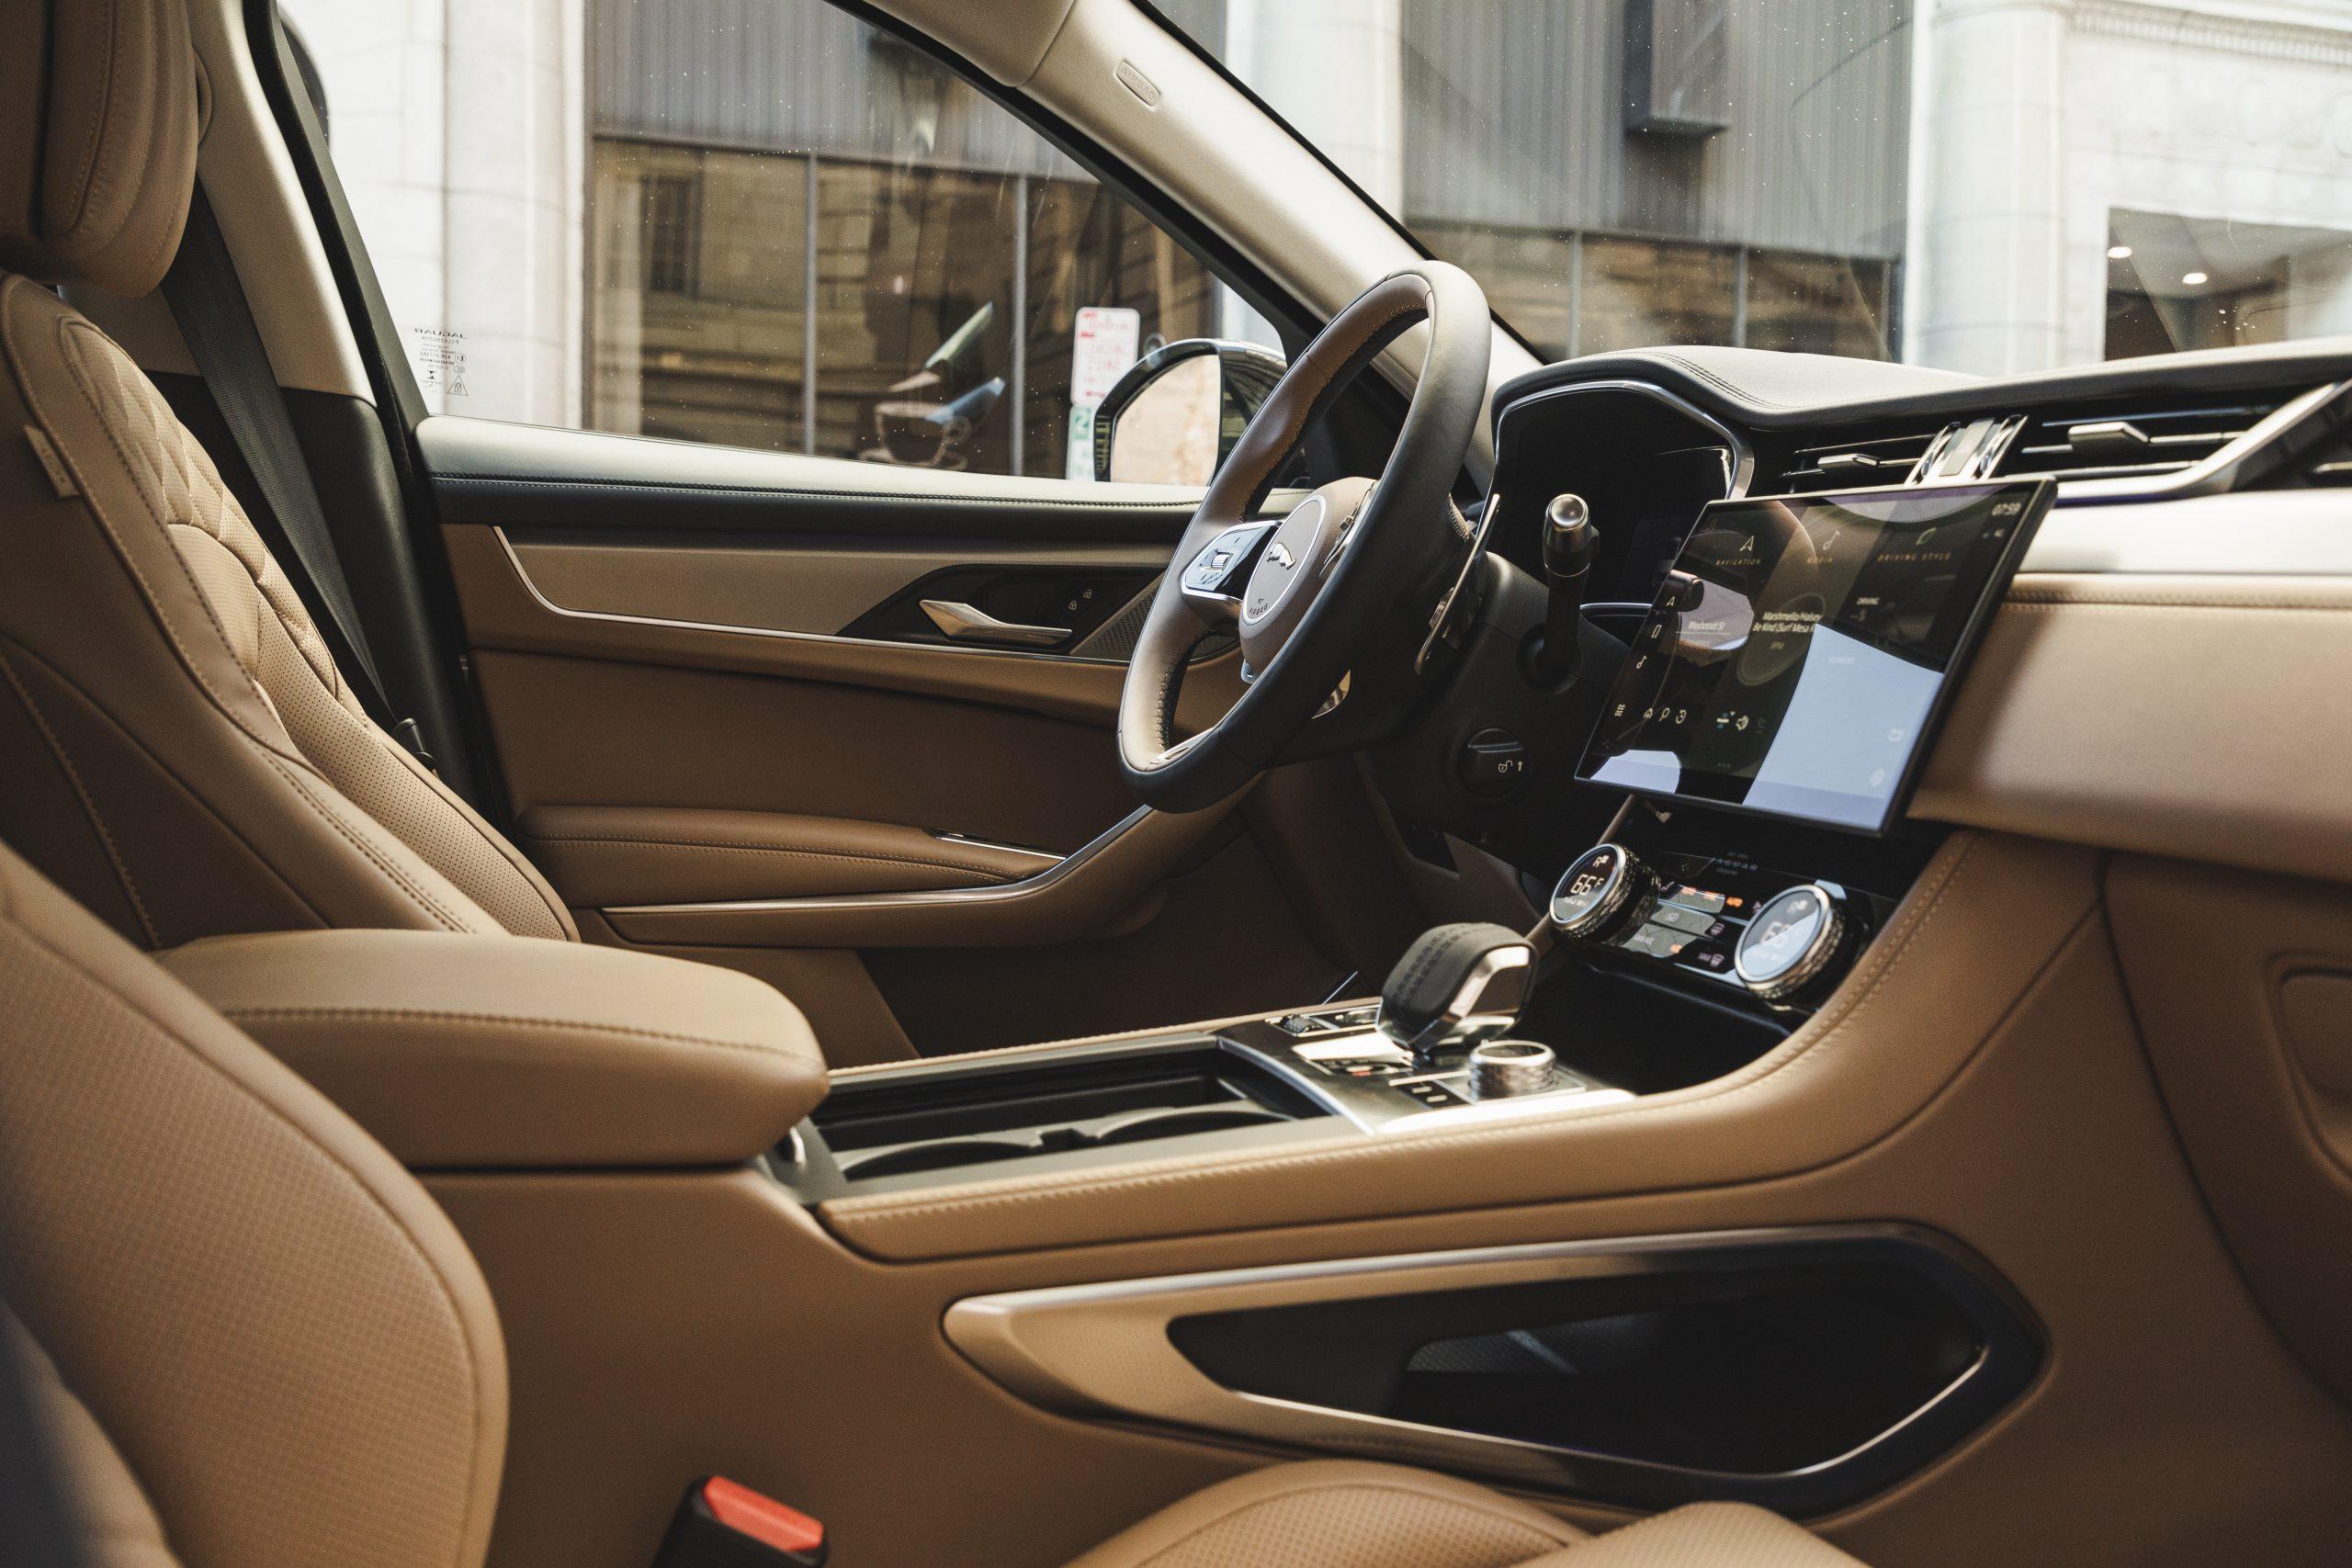 2021 Jaguar F-PACE S P340 interior